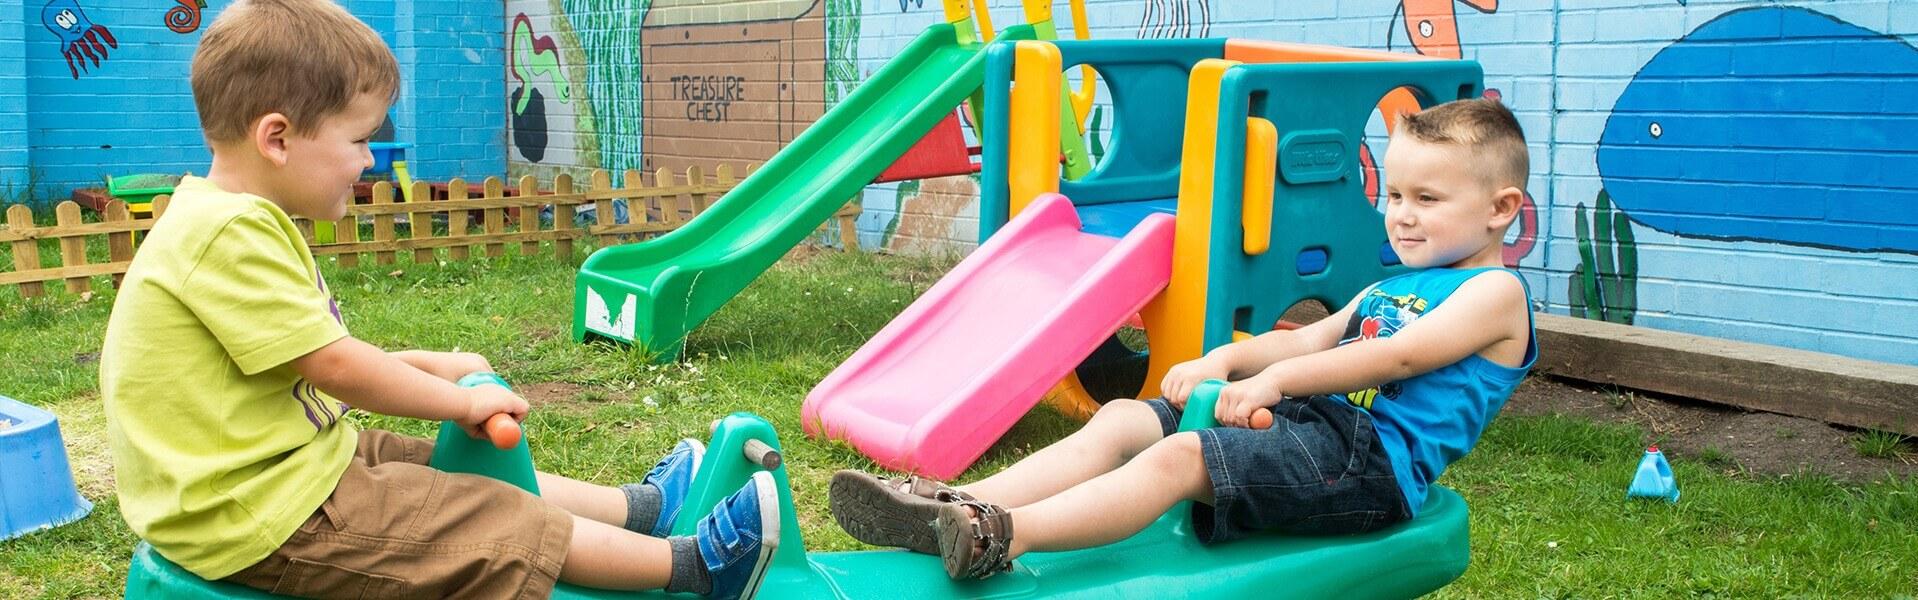 Barry Nursery Playschool